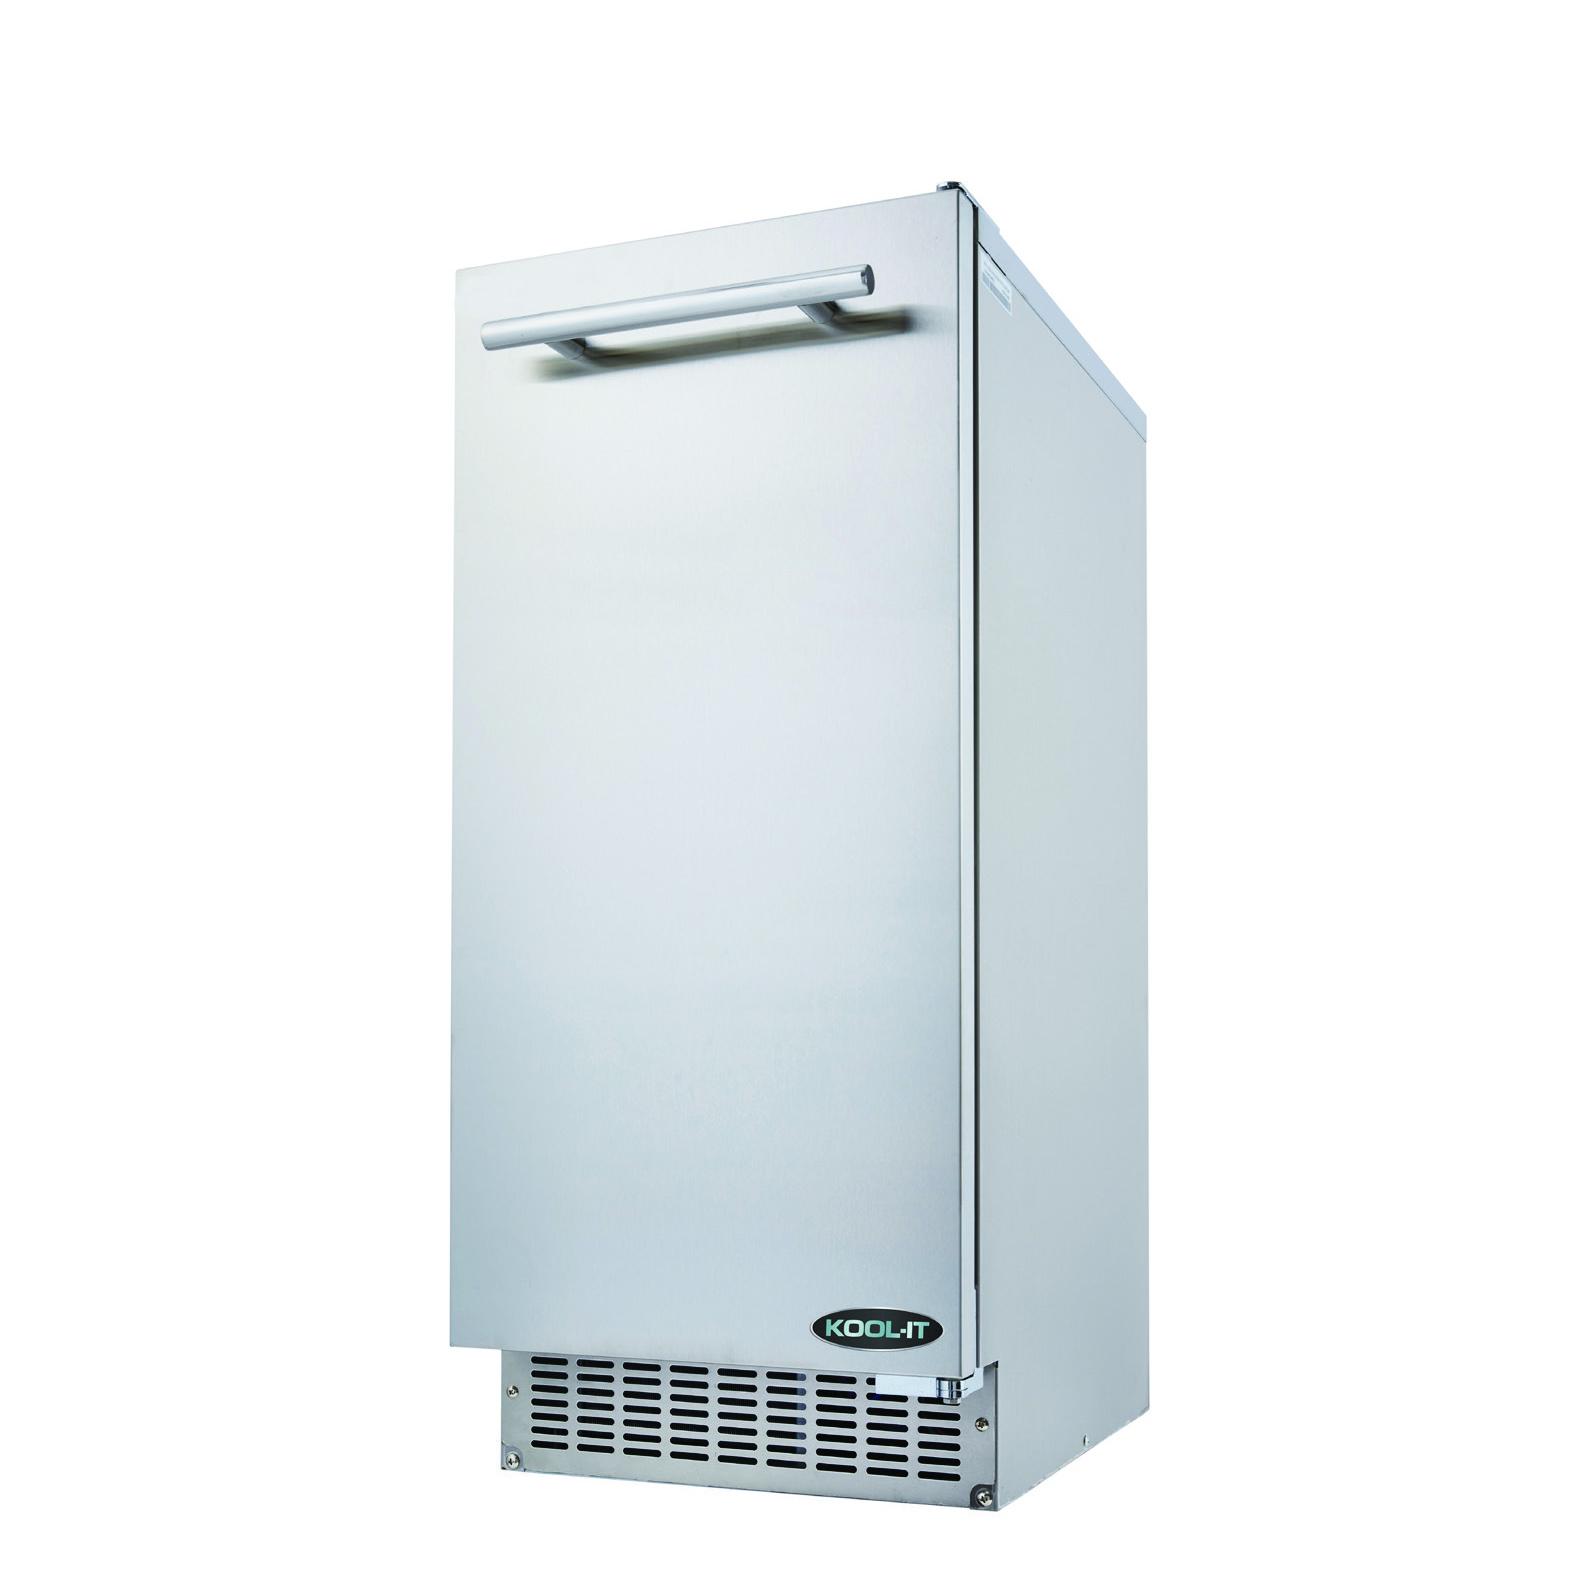 MVP Group LLC KRU-70-AB ice maker with bin, cube-style